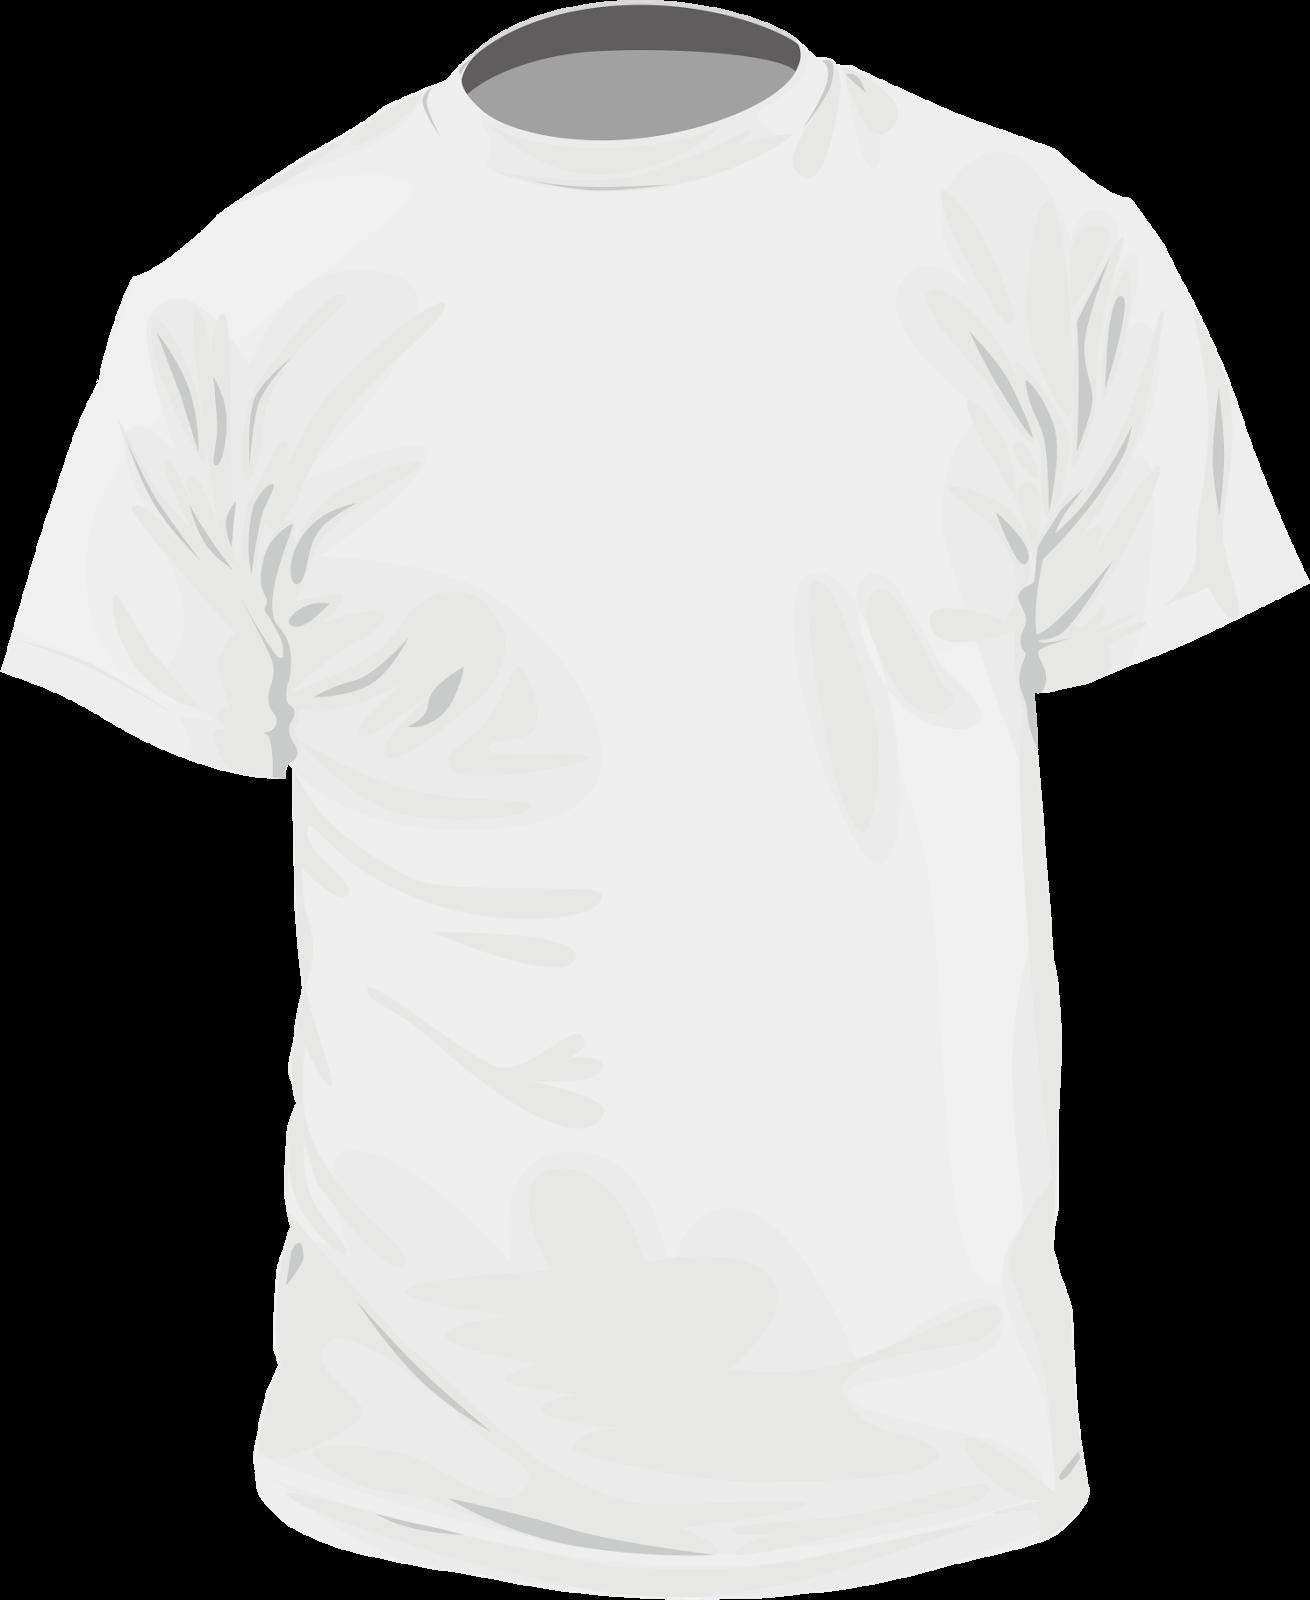 Vector Kaos Png : vector, Vector, Logo:, Template, T-Shirt, Putih, (White), Kaos,, Desain, Logo,